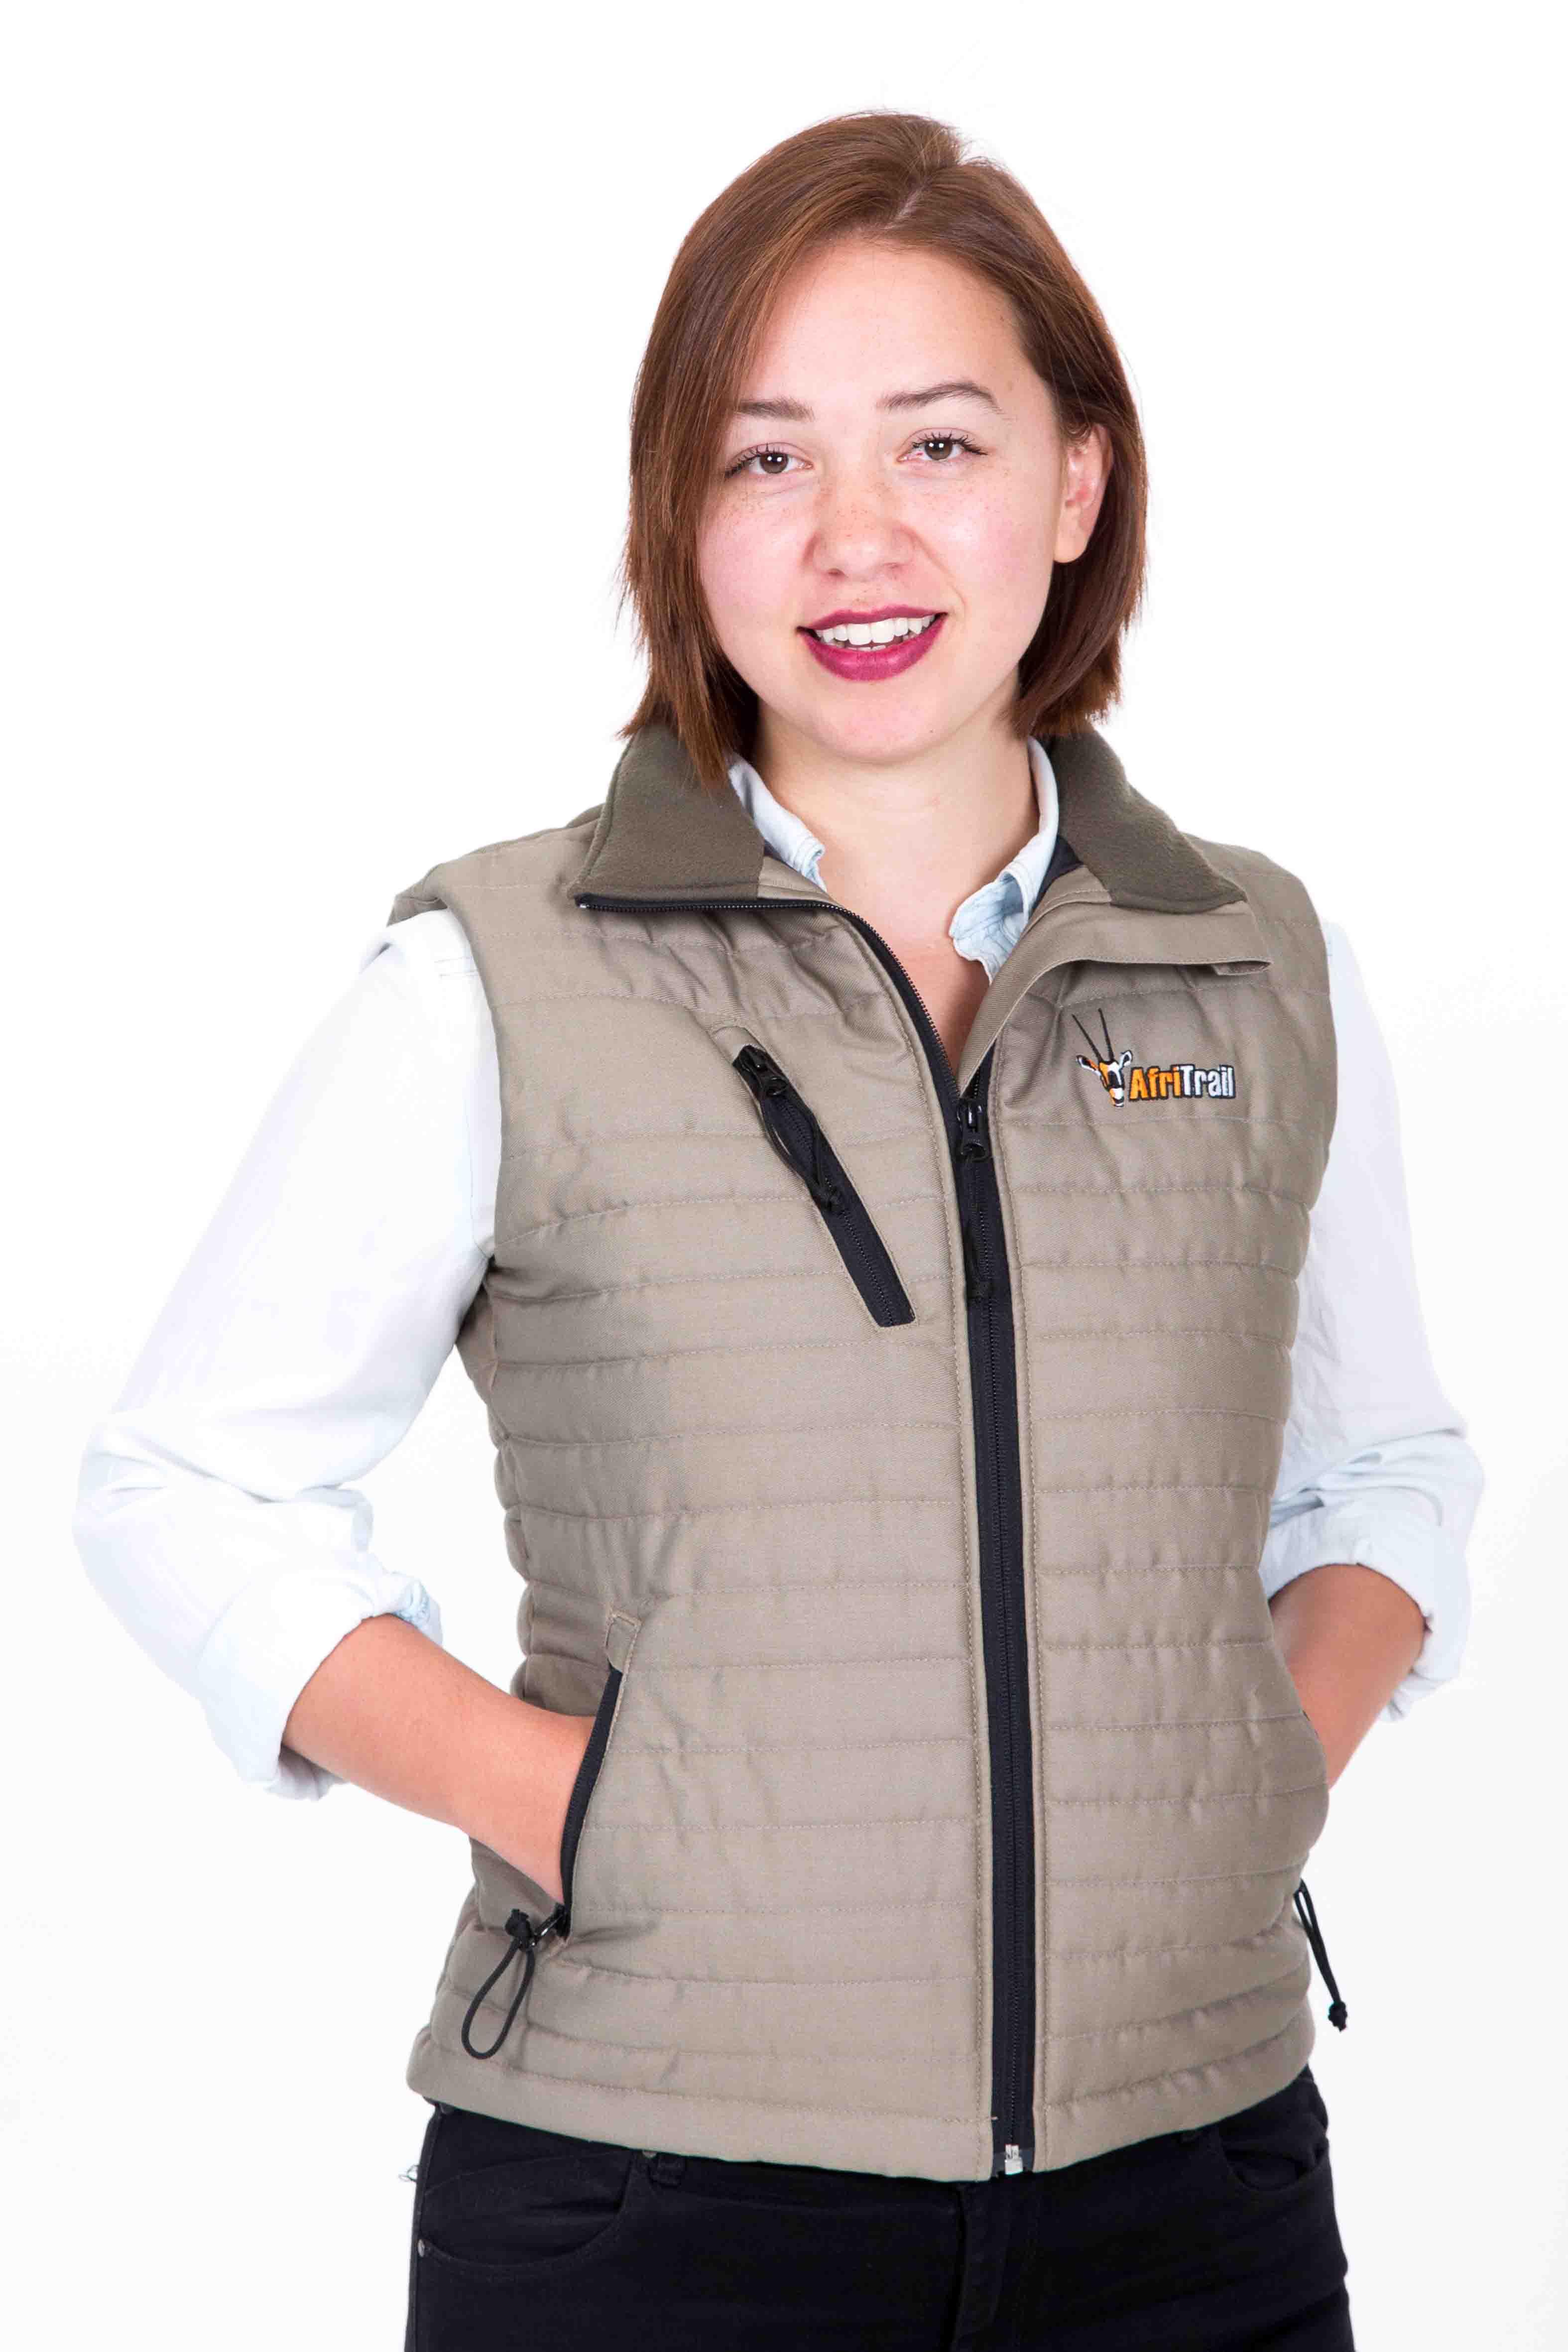 afritrail-pc-twill-women's-vest